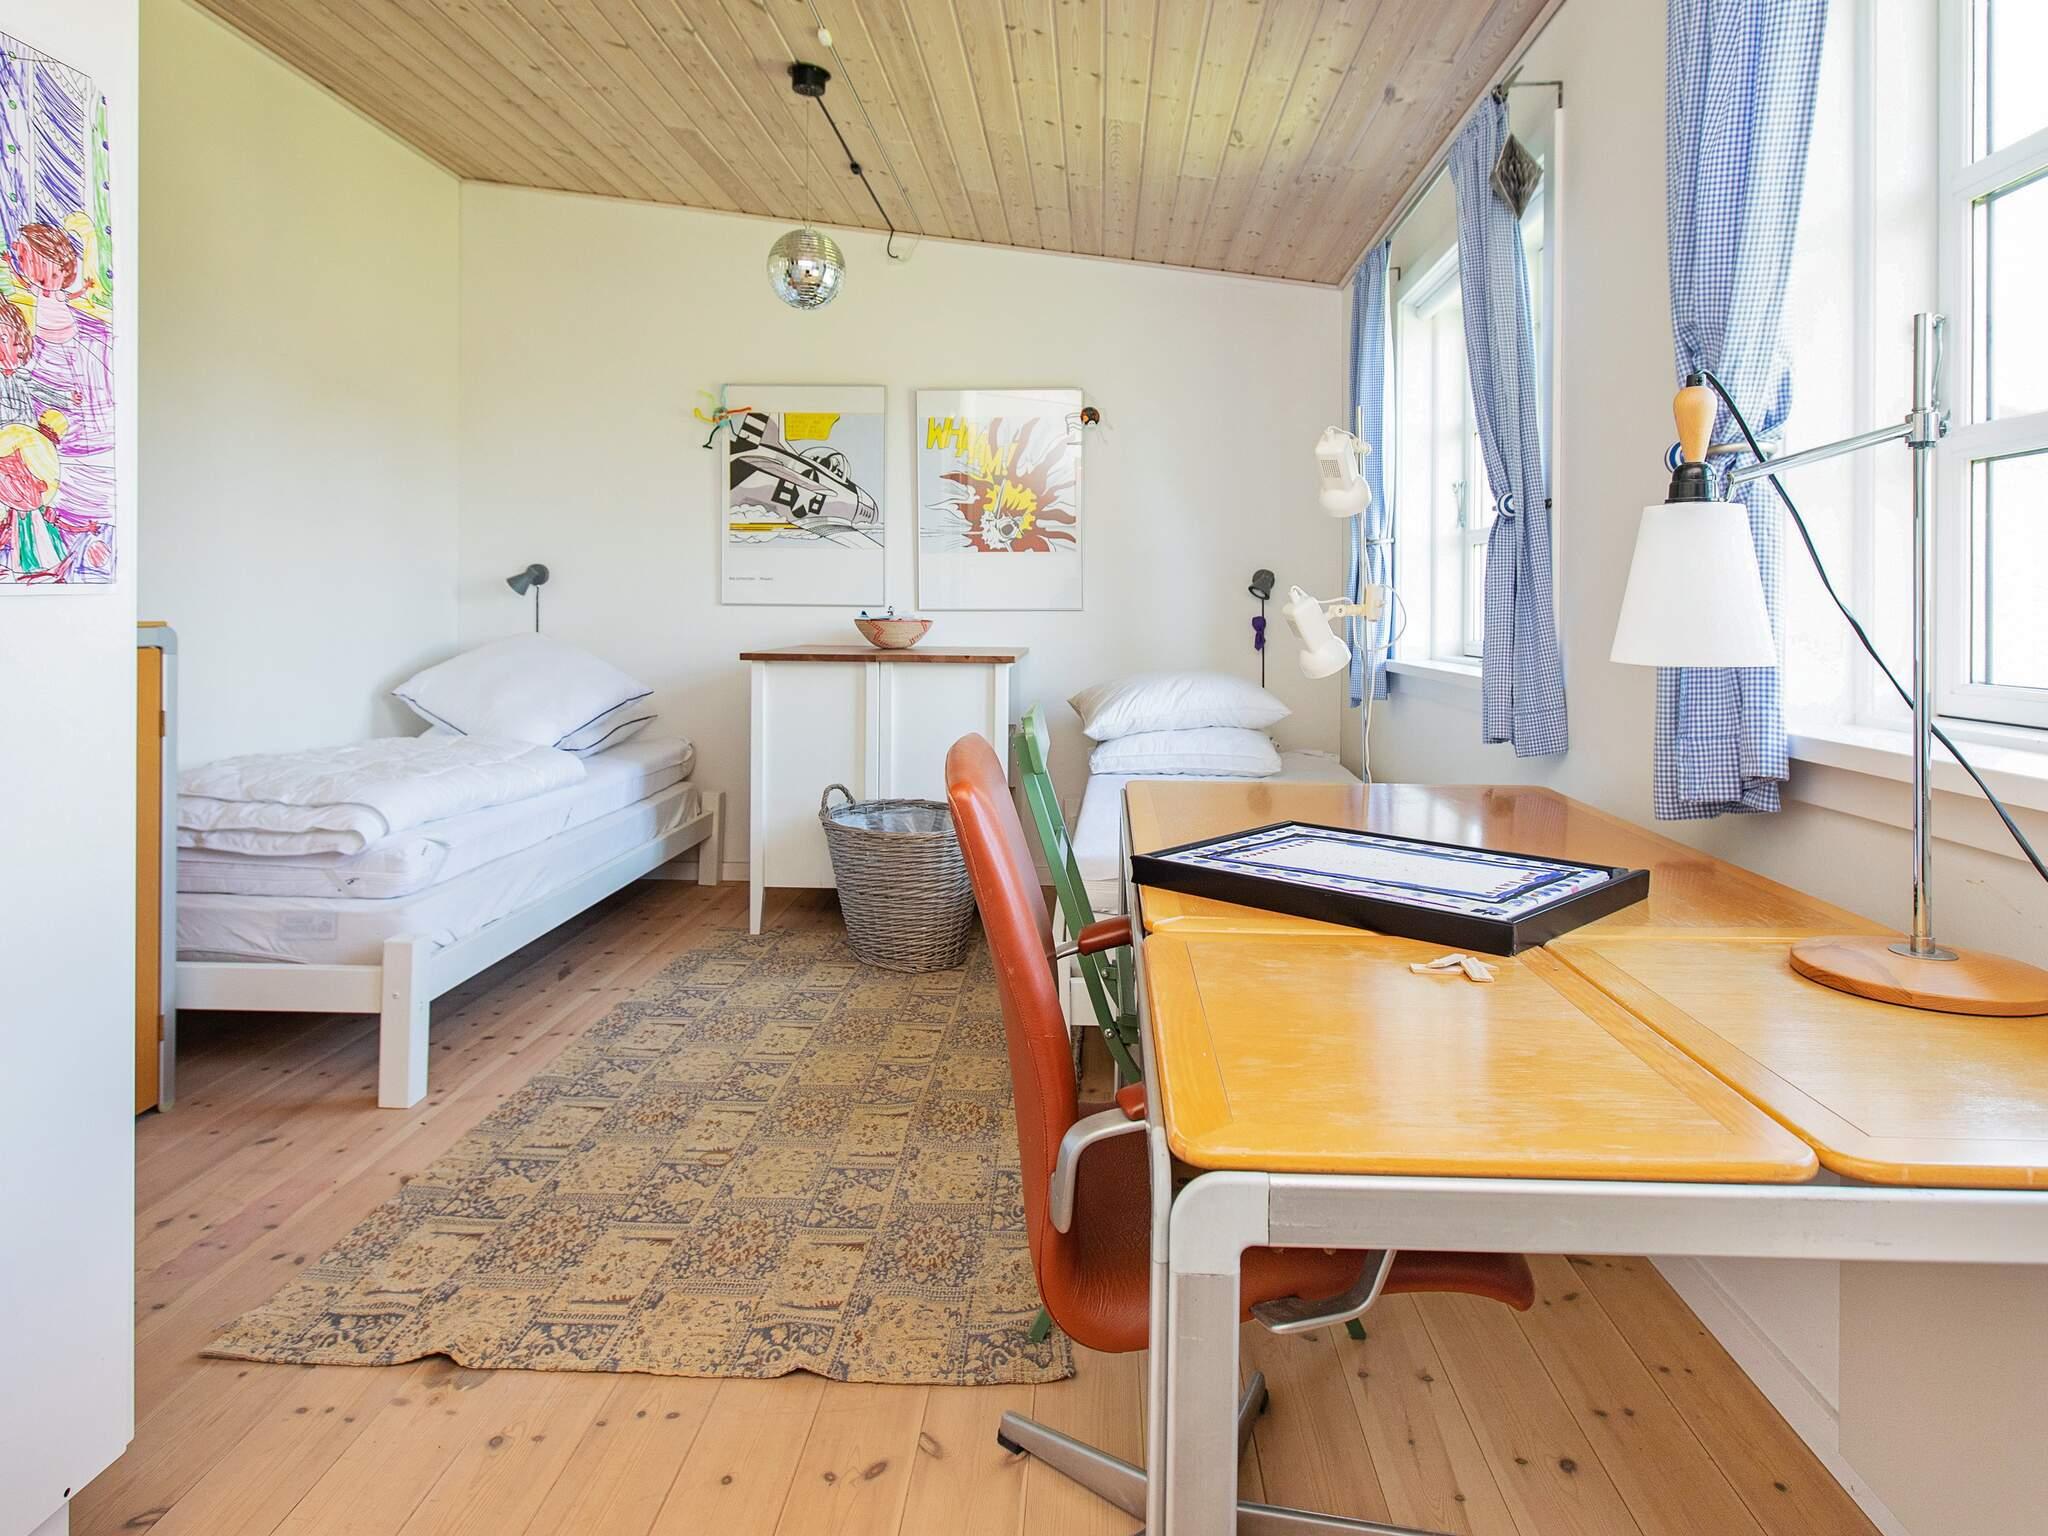 Ferienhaus Vejby Strand (2527287), Vejby, , Nordseeland, Dänemark, Bild 9